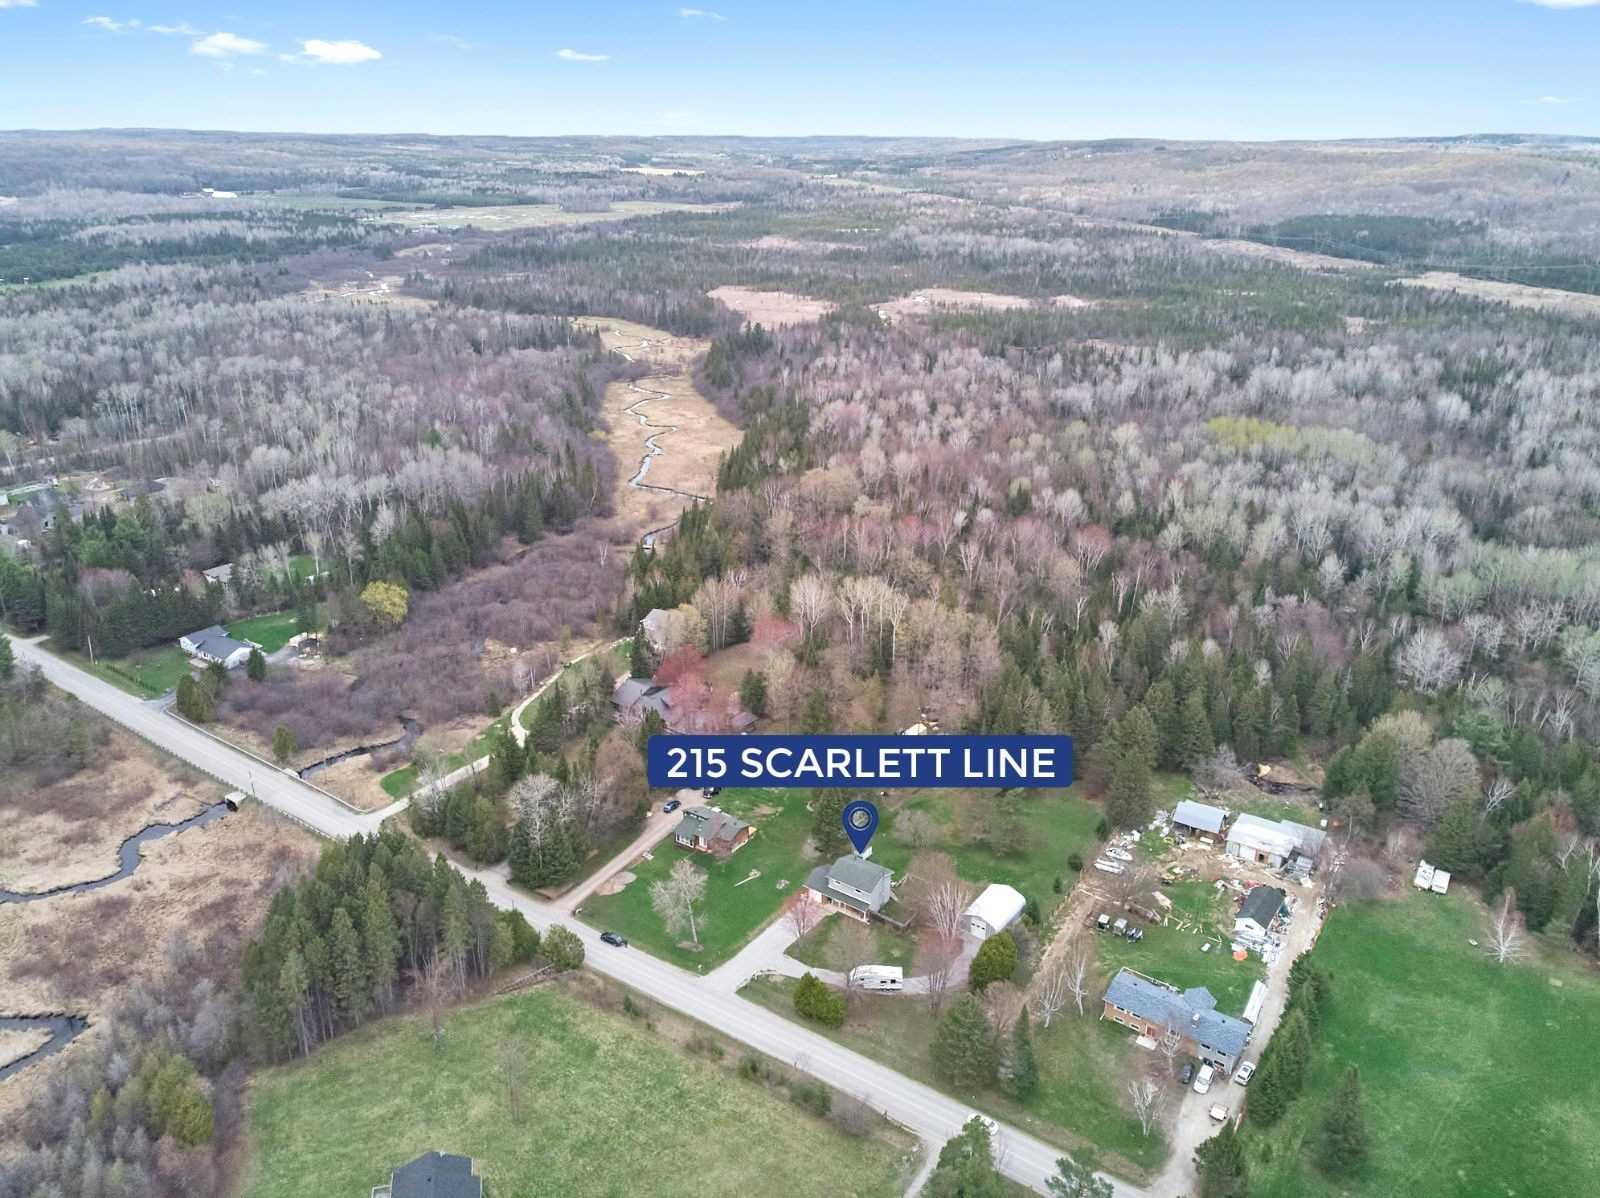 215 Scarlett Line